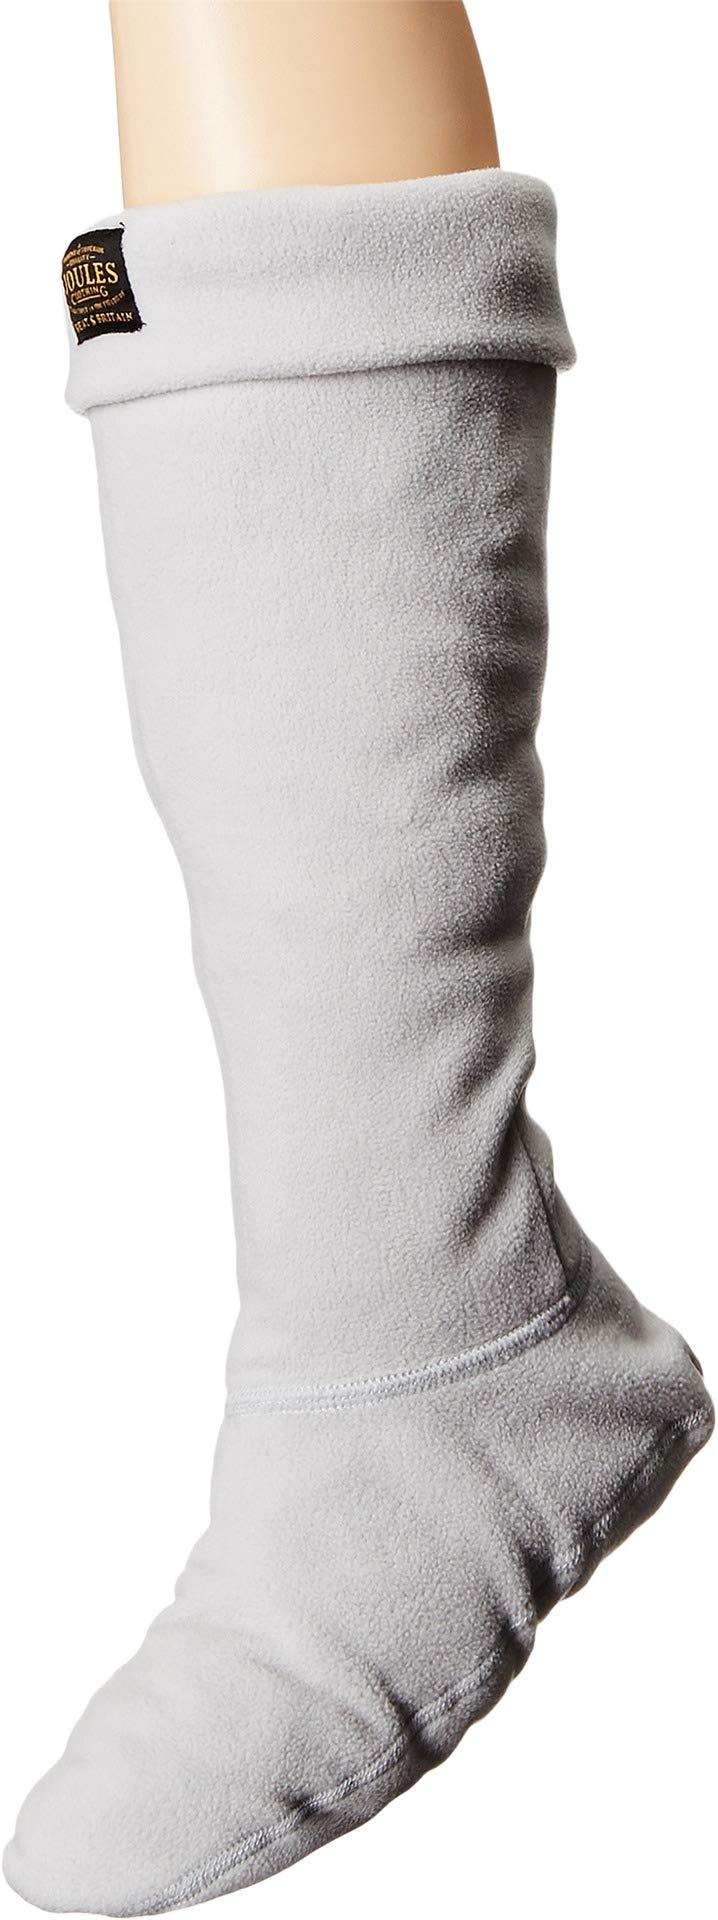 Joules Women's Weltonus Rain Boot Sock, Silver,Medium,US